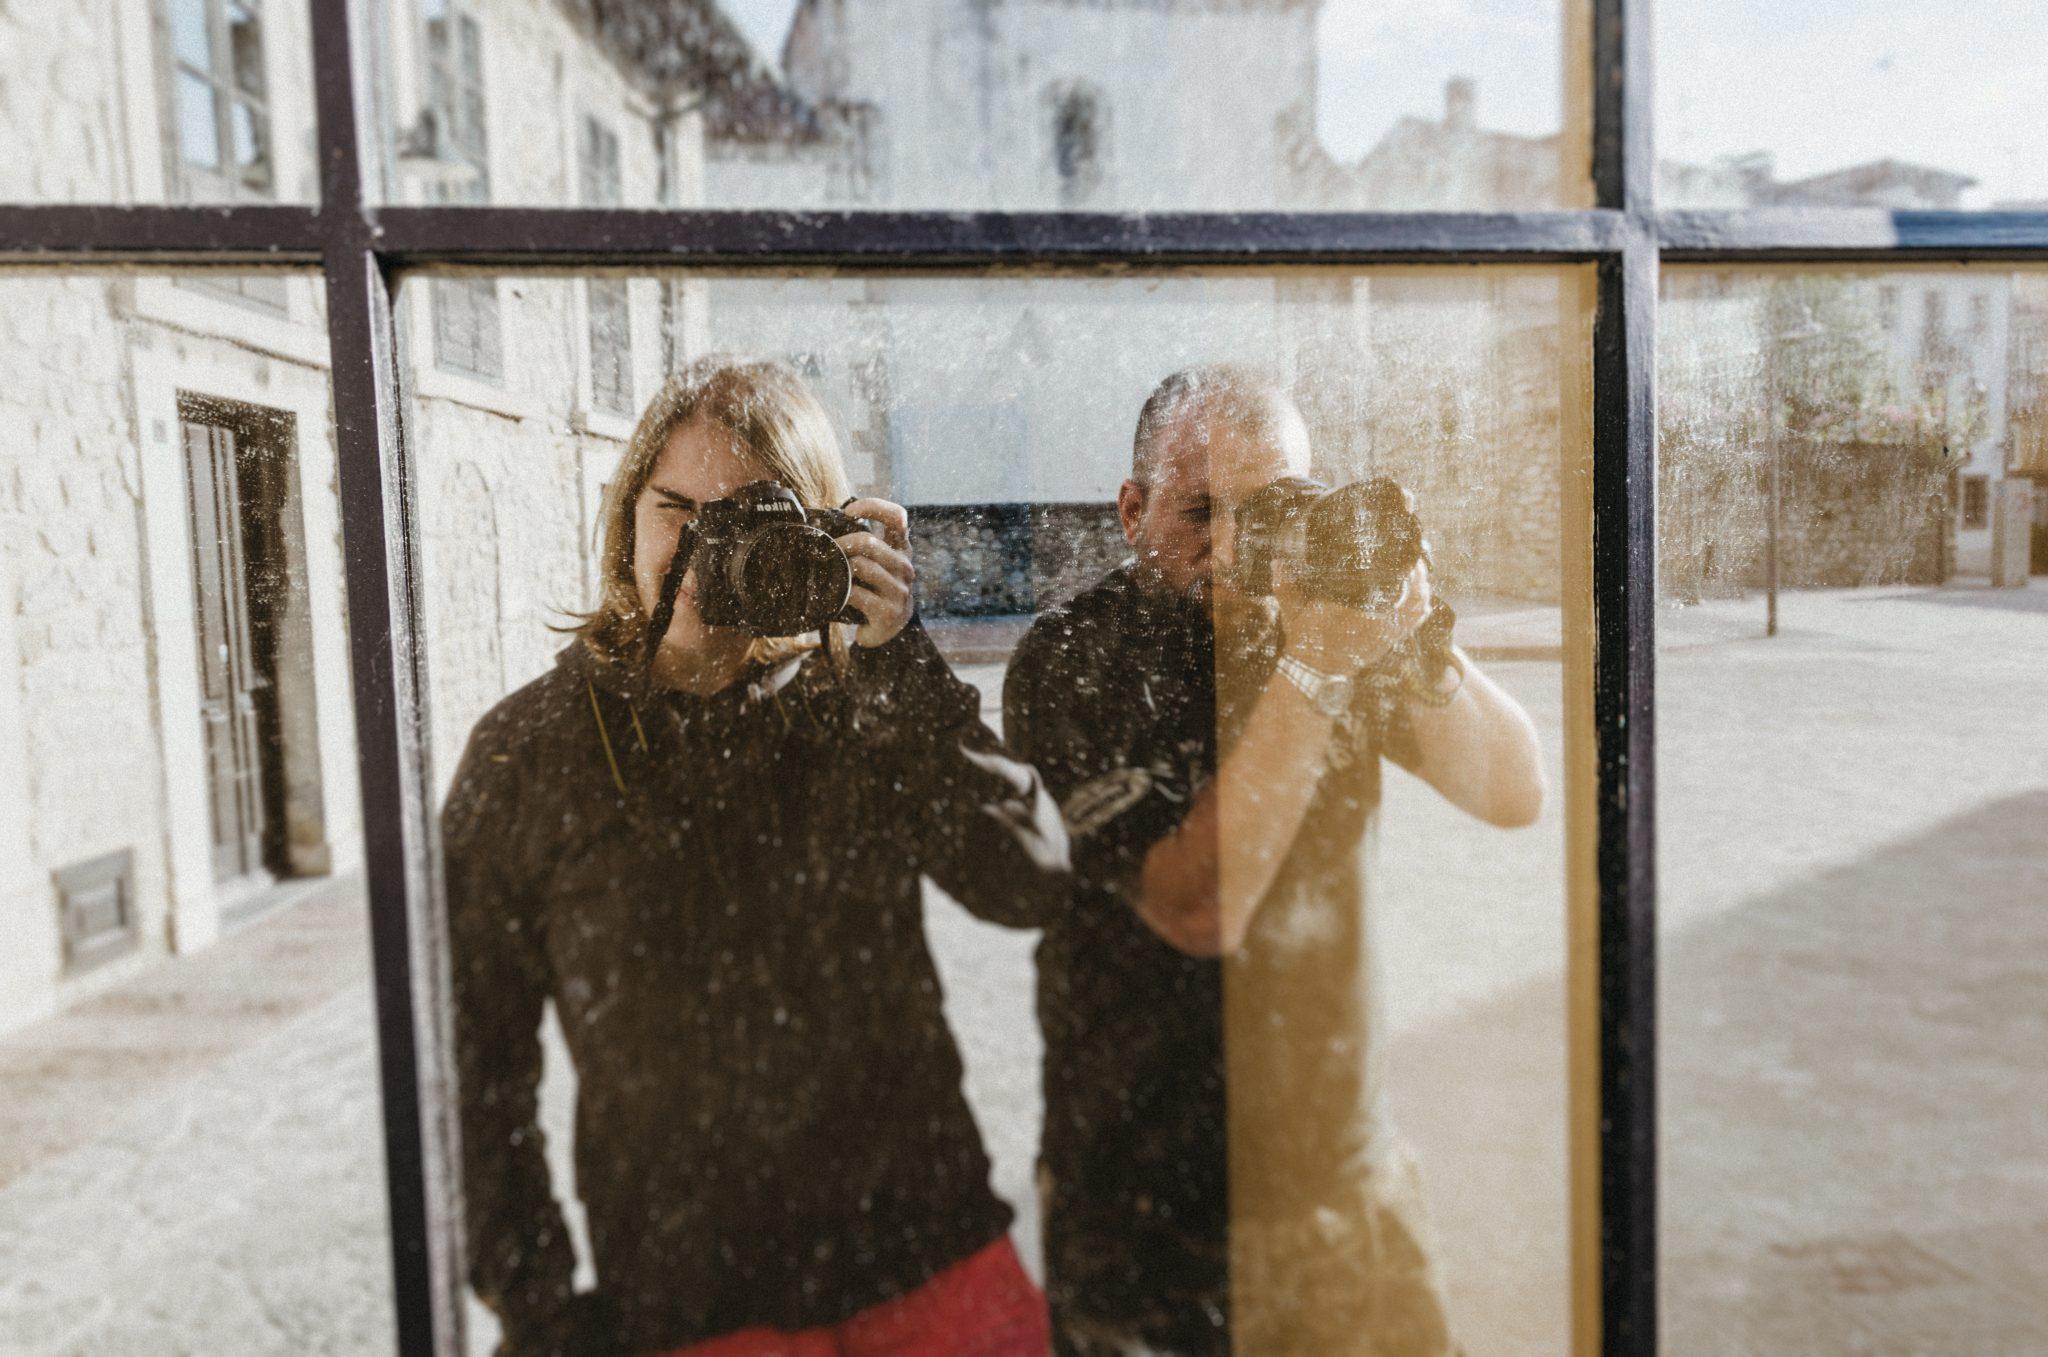 Somos María (fotógrafa) y Fernando (videógrafo), Photoletum Studio